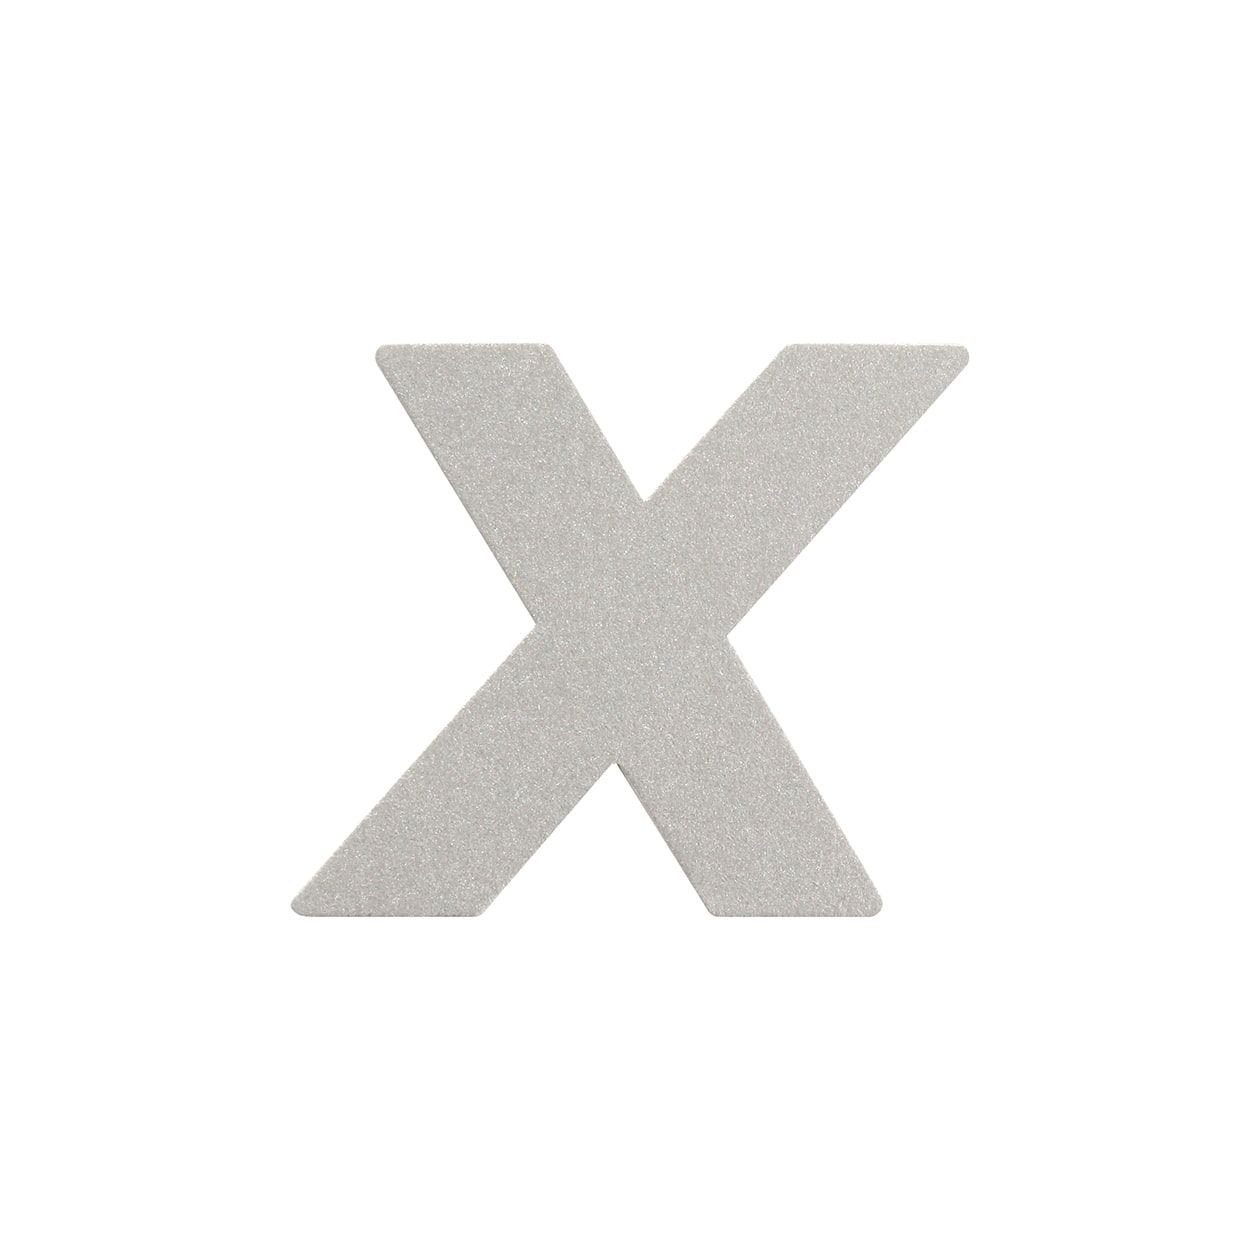 No.395ボード A7カードDC 文字X シルバー